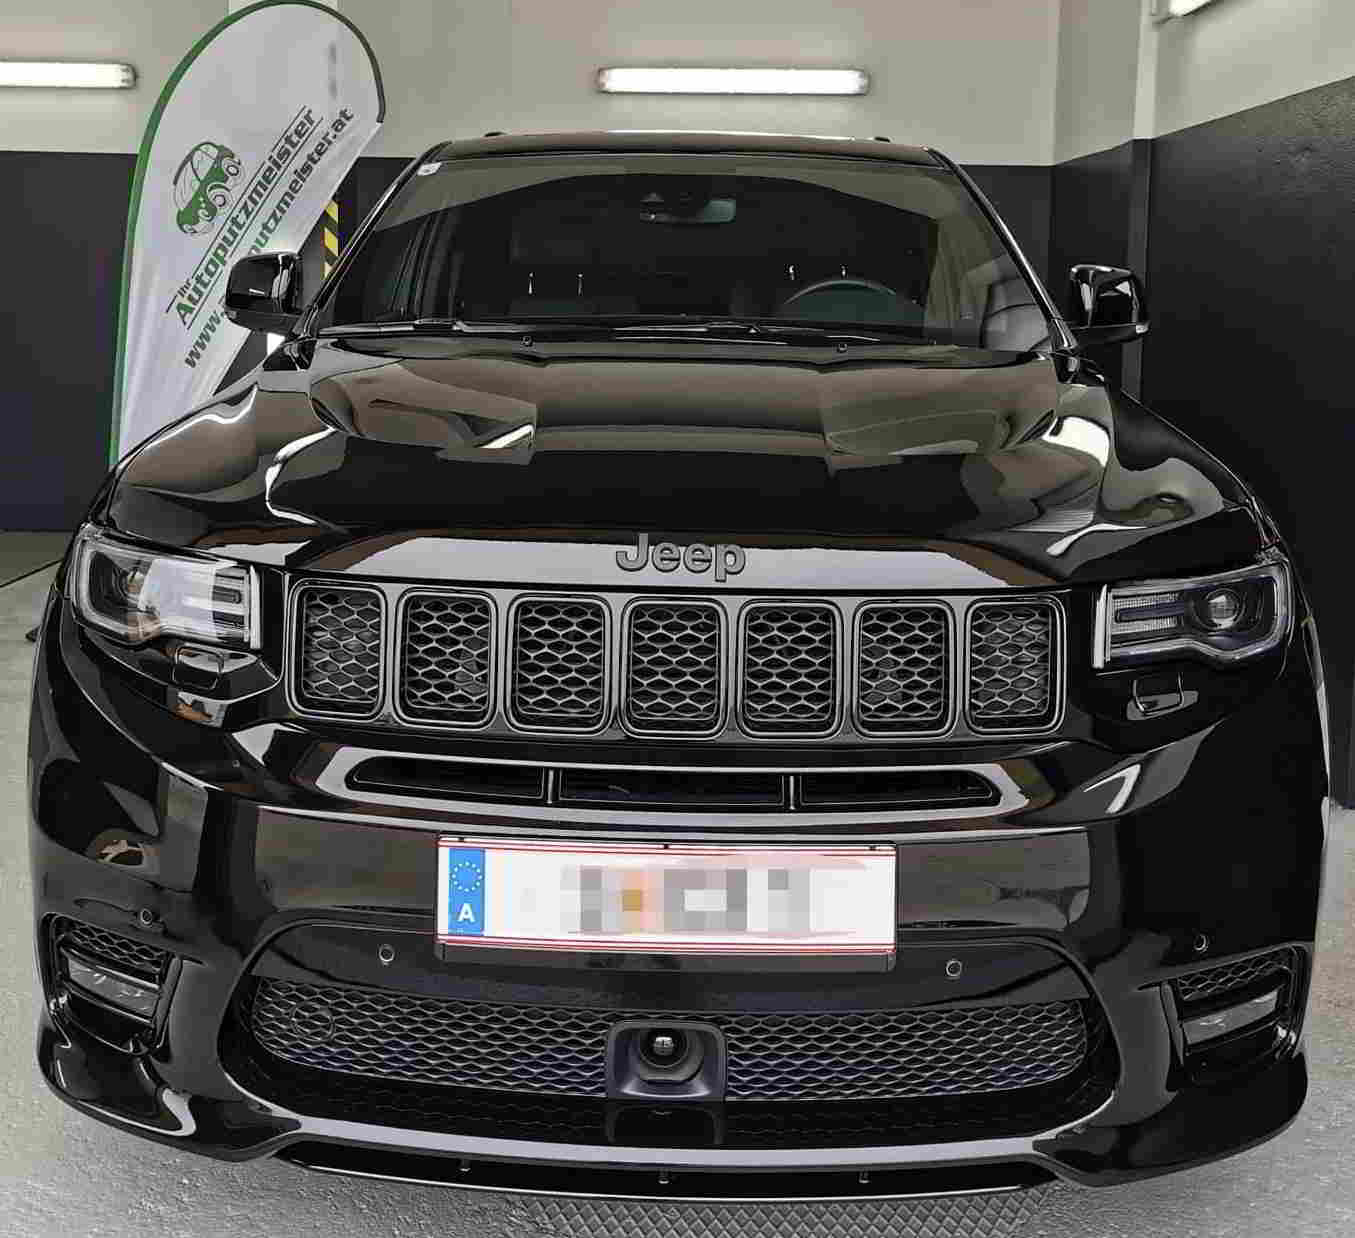 BRILA Salzburg Premium Body Coating Jeep